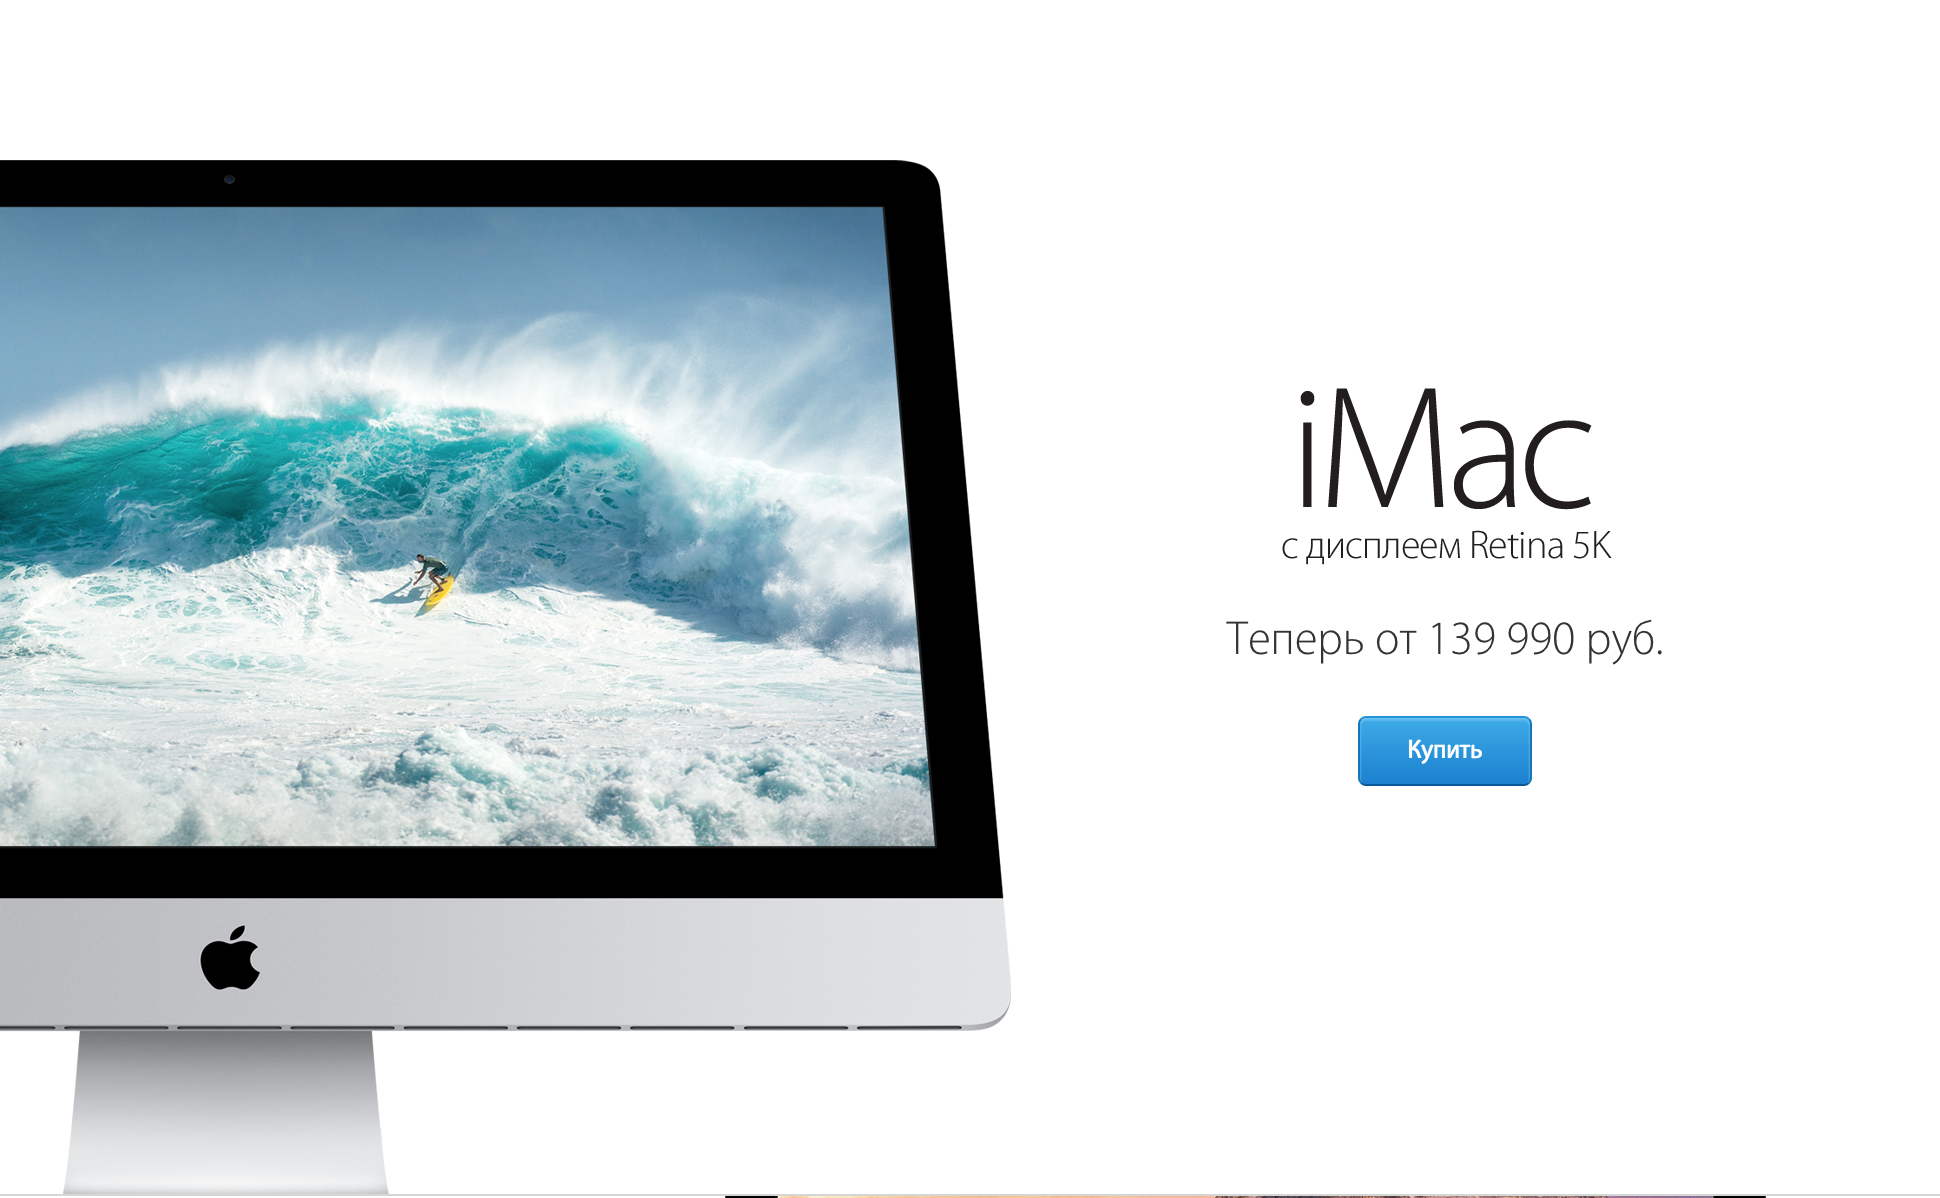 iMac с Retina можно приобрести за $1999